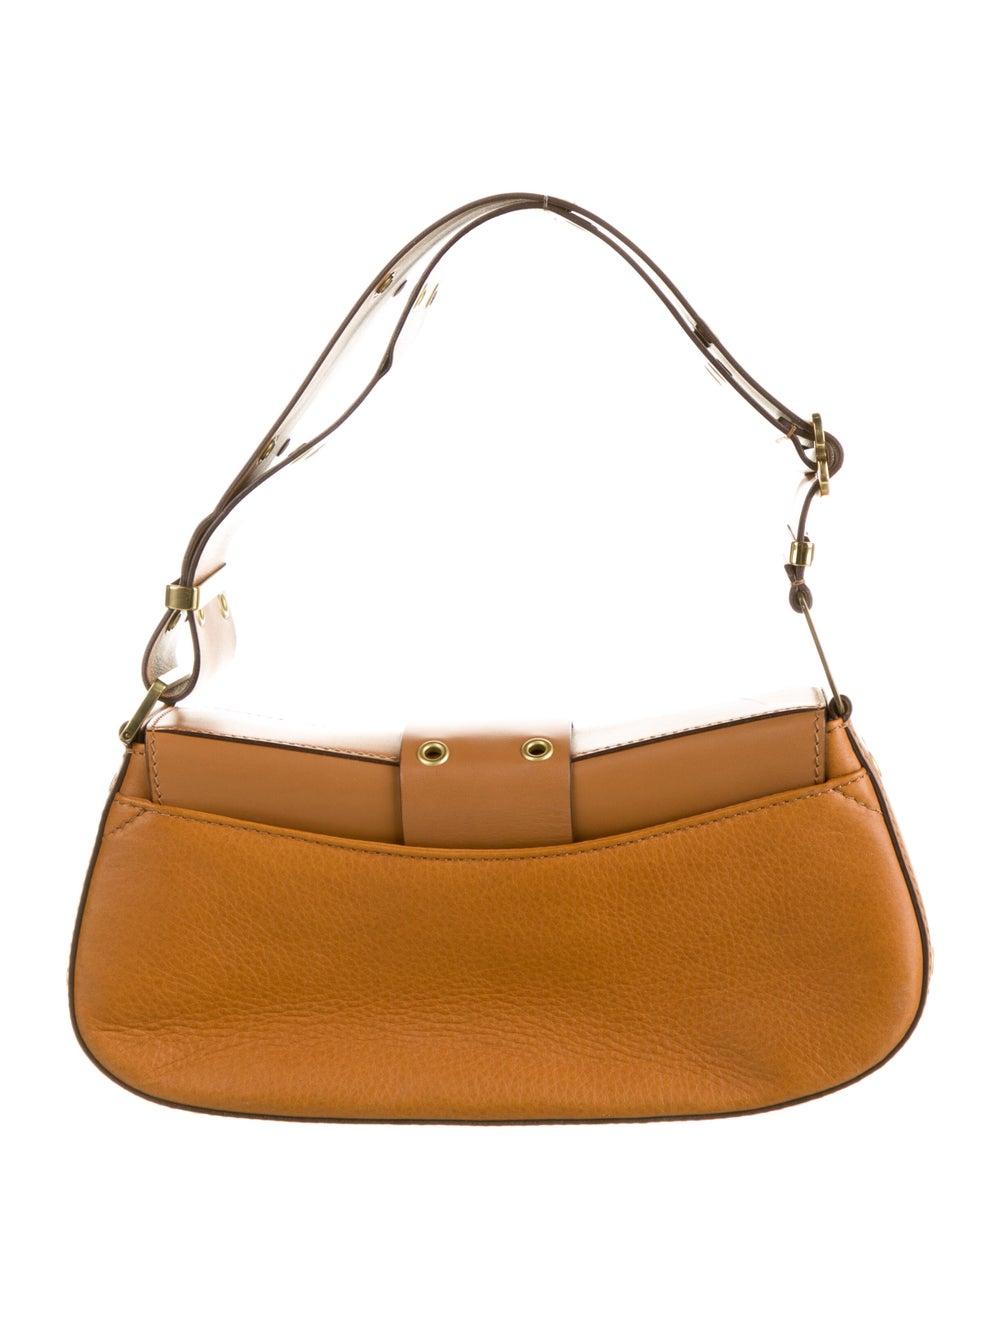 Christian Dior Street Chic Columbus Bag Gold - image 4